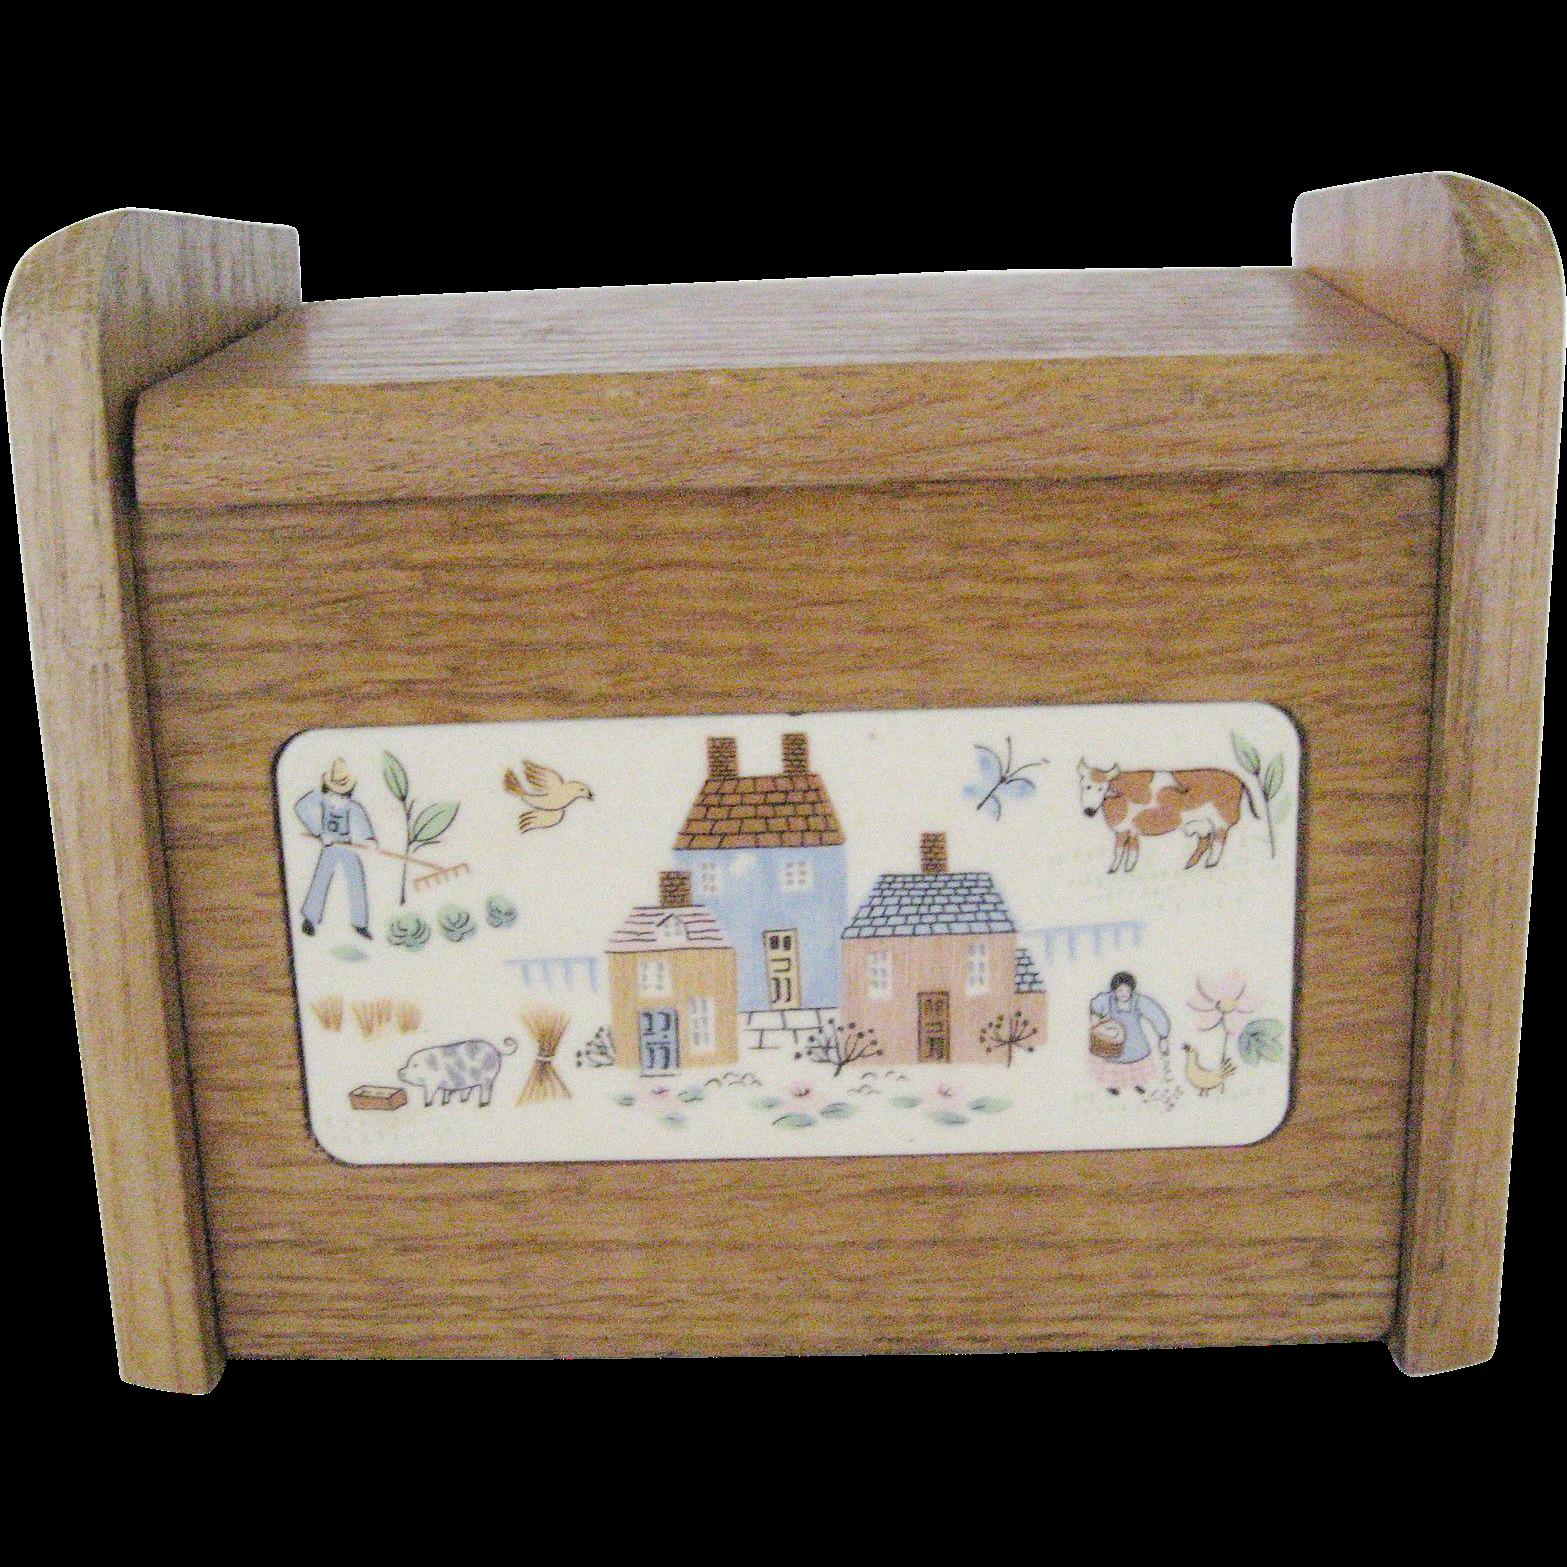 International Heartland Wooden Recipe Box